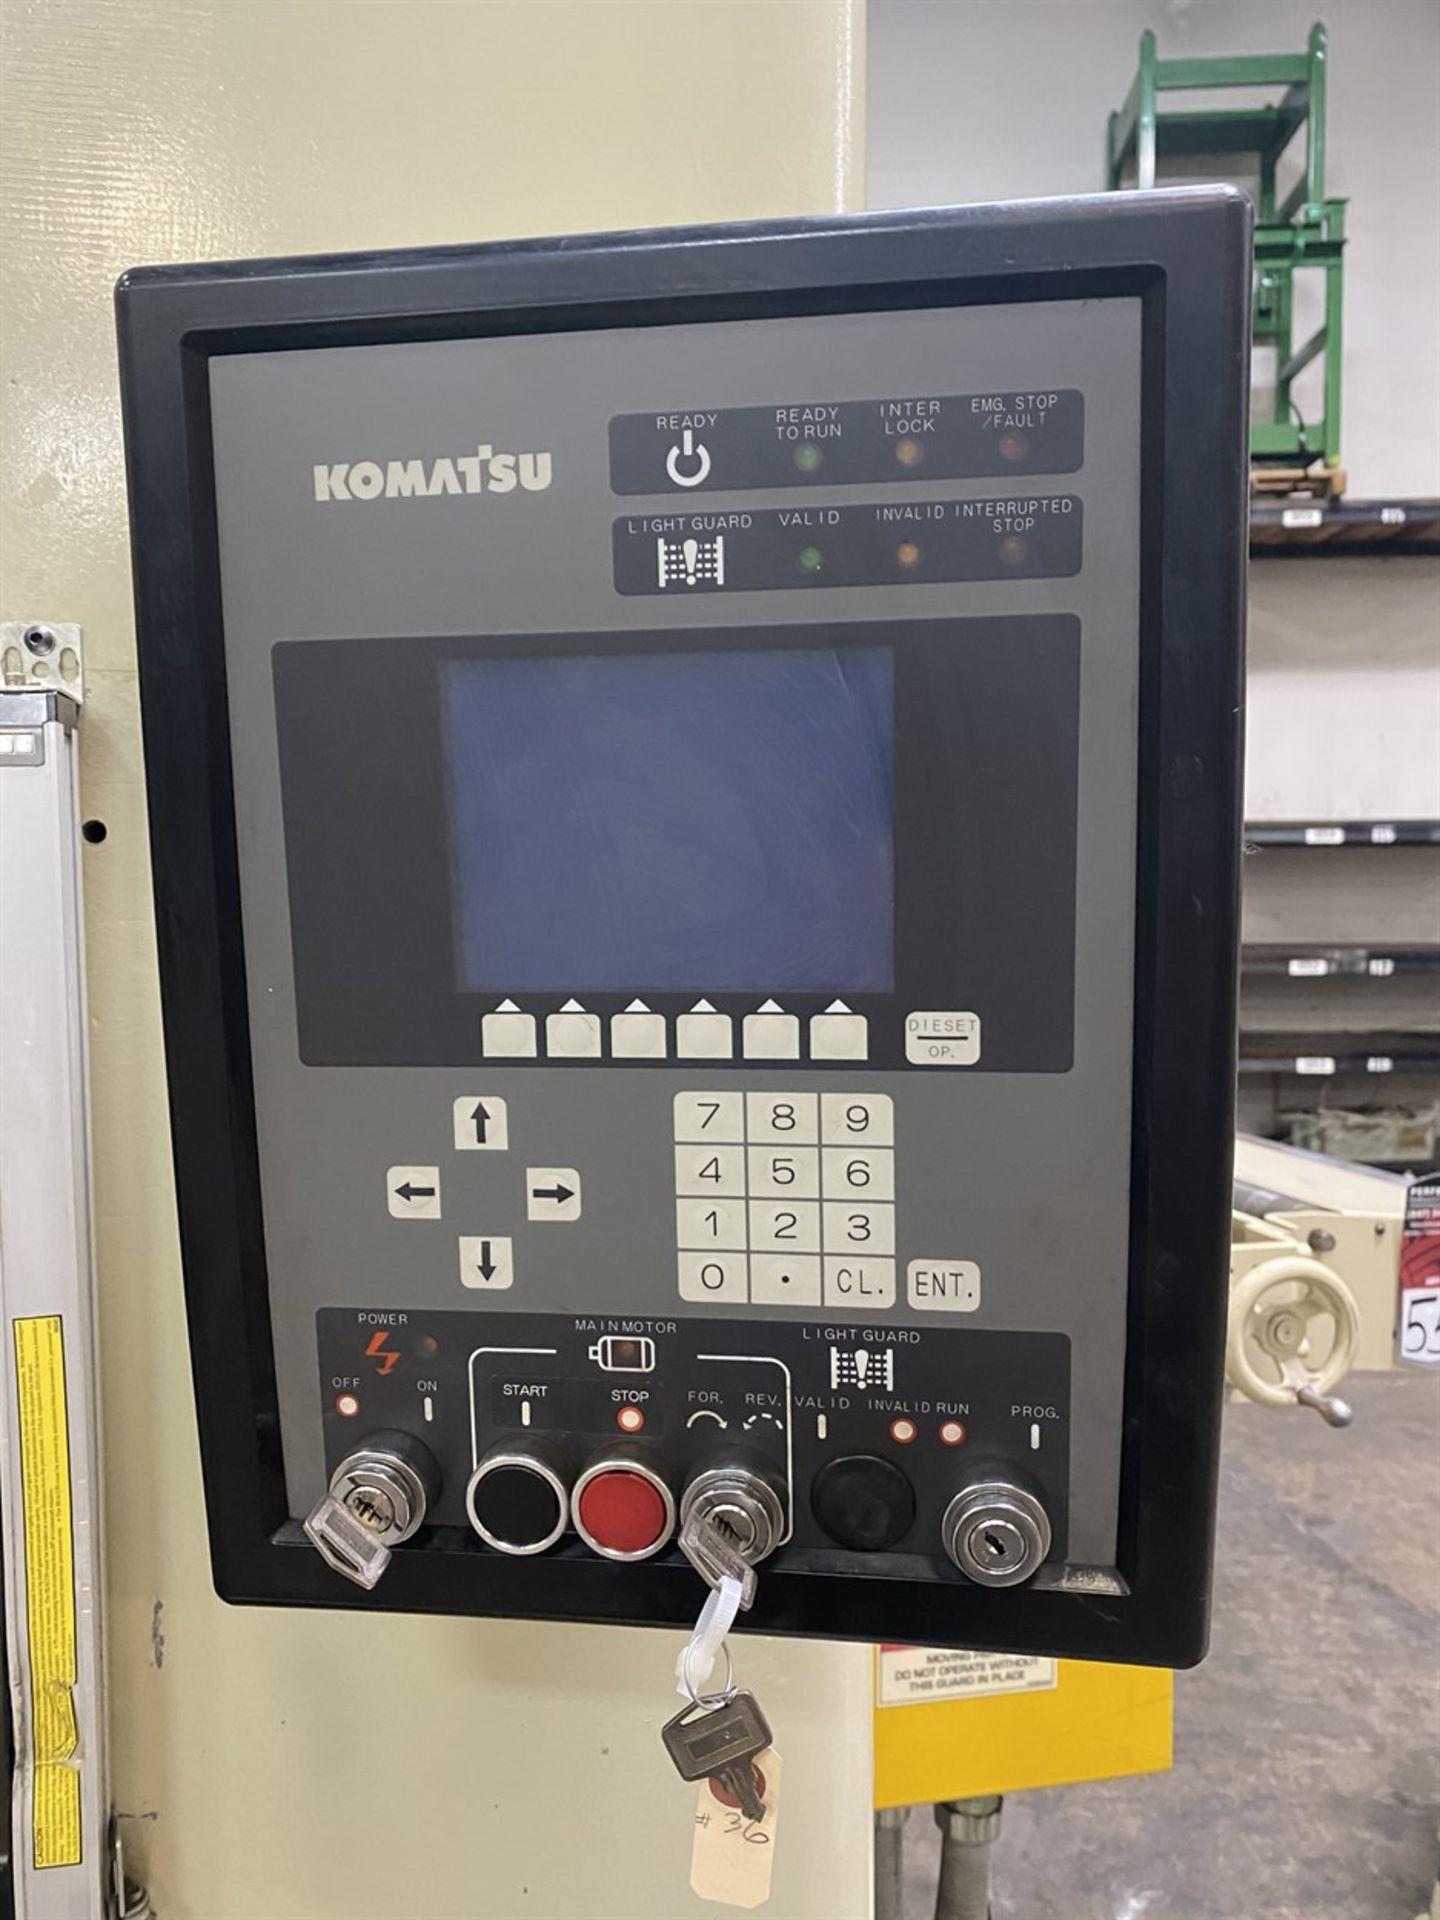 "Lot 54 - 2003 KOMATSU E2W 300 Straight Side Press, s/n 10047, 300 Ton Capacity, 20-40 SPM, 11.81"" Stroke,"